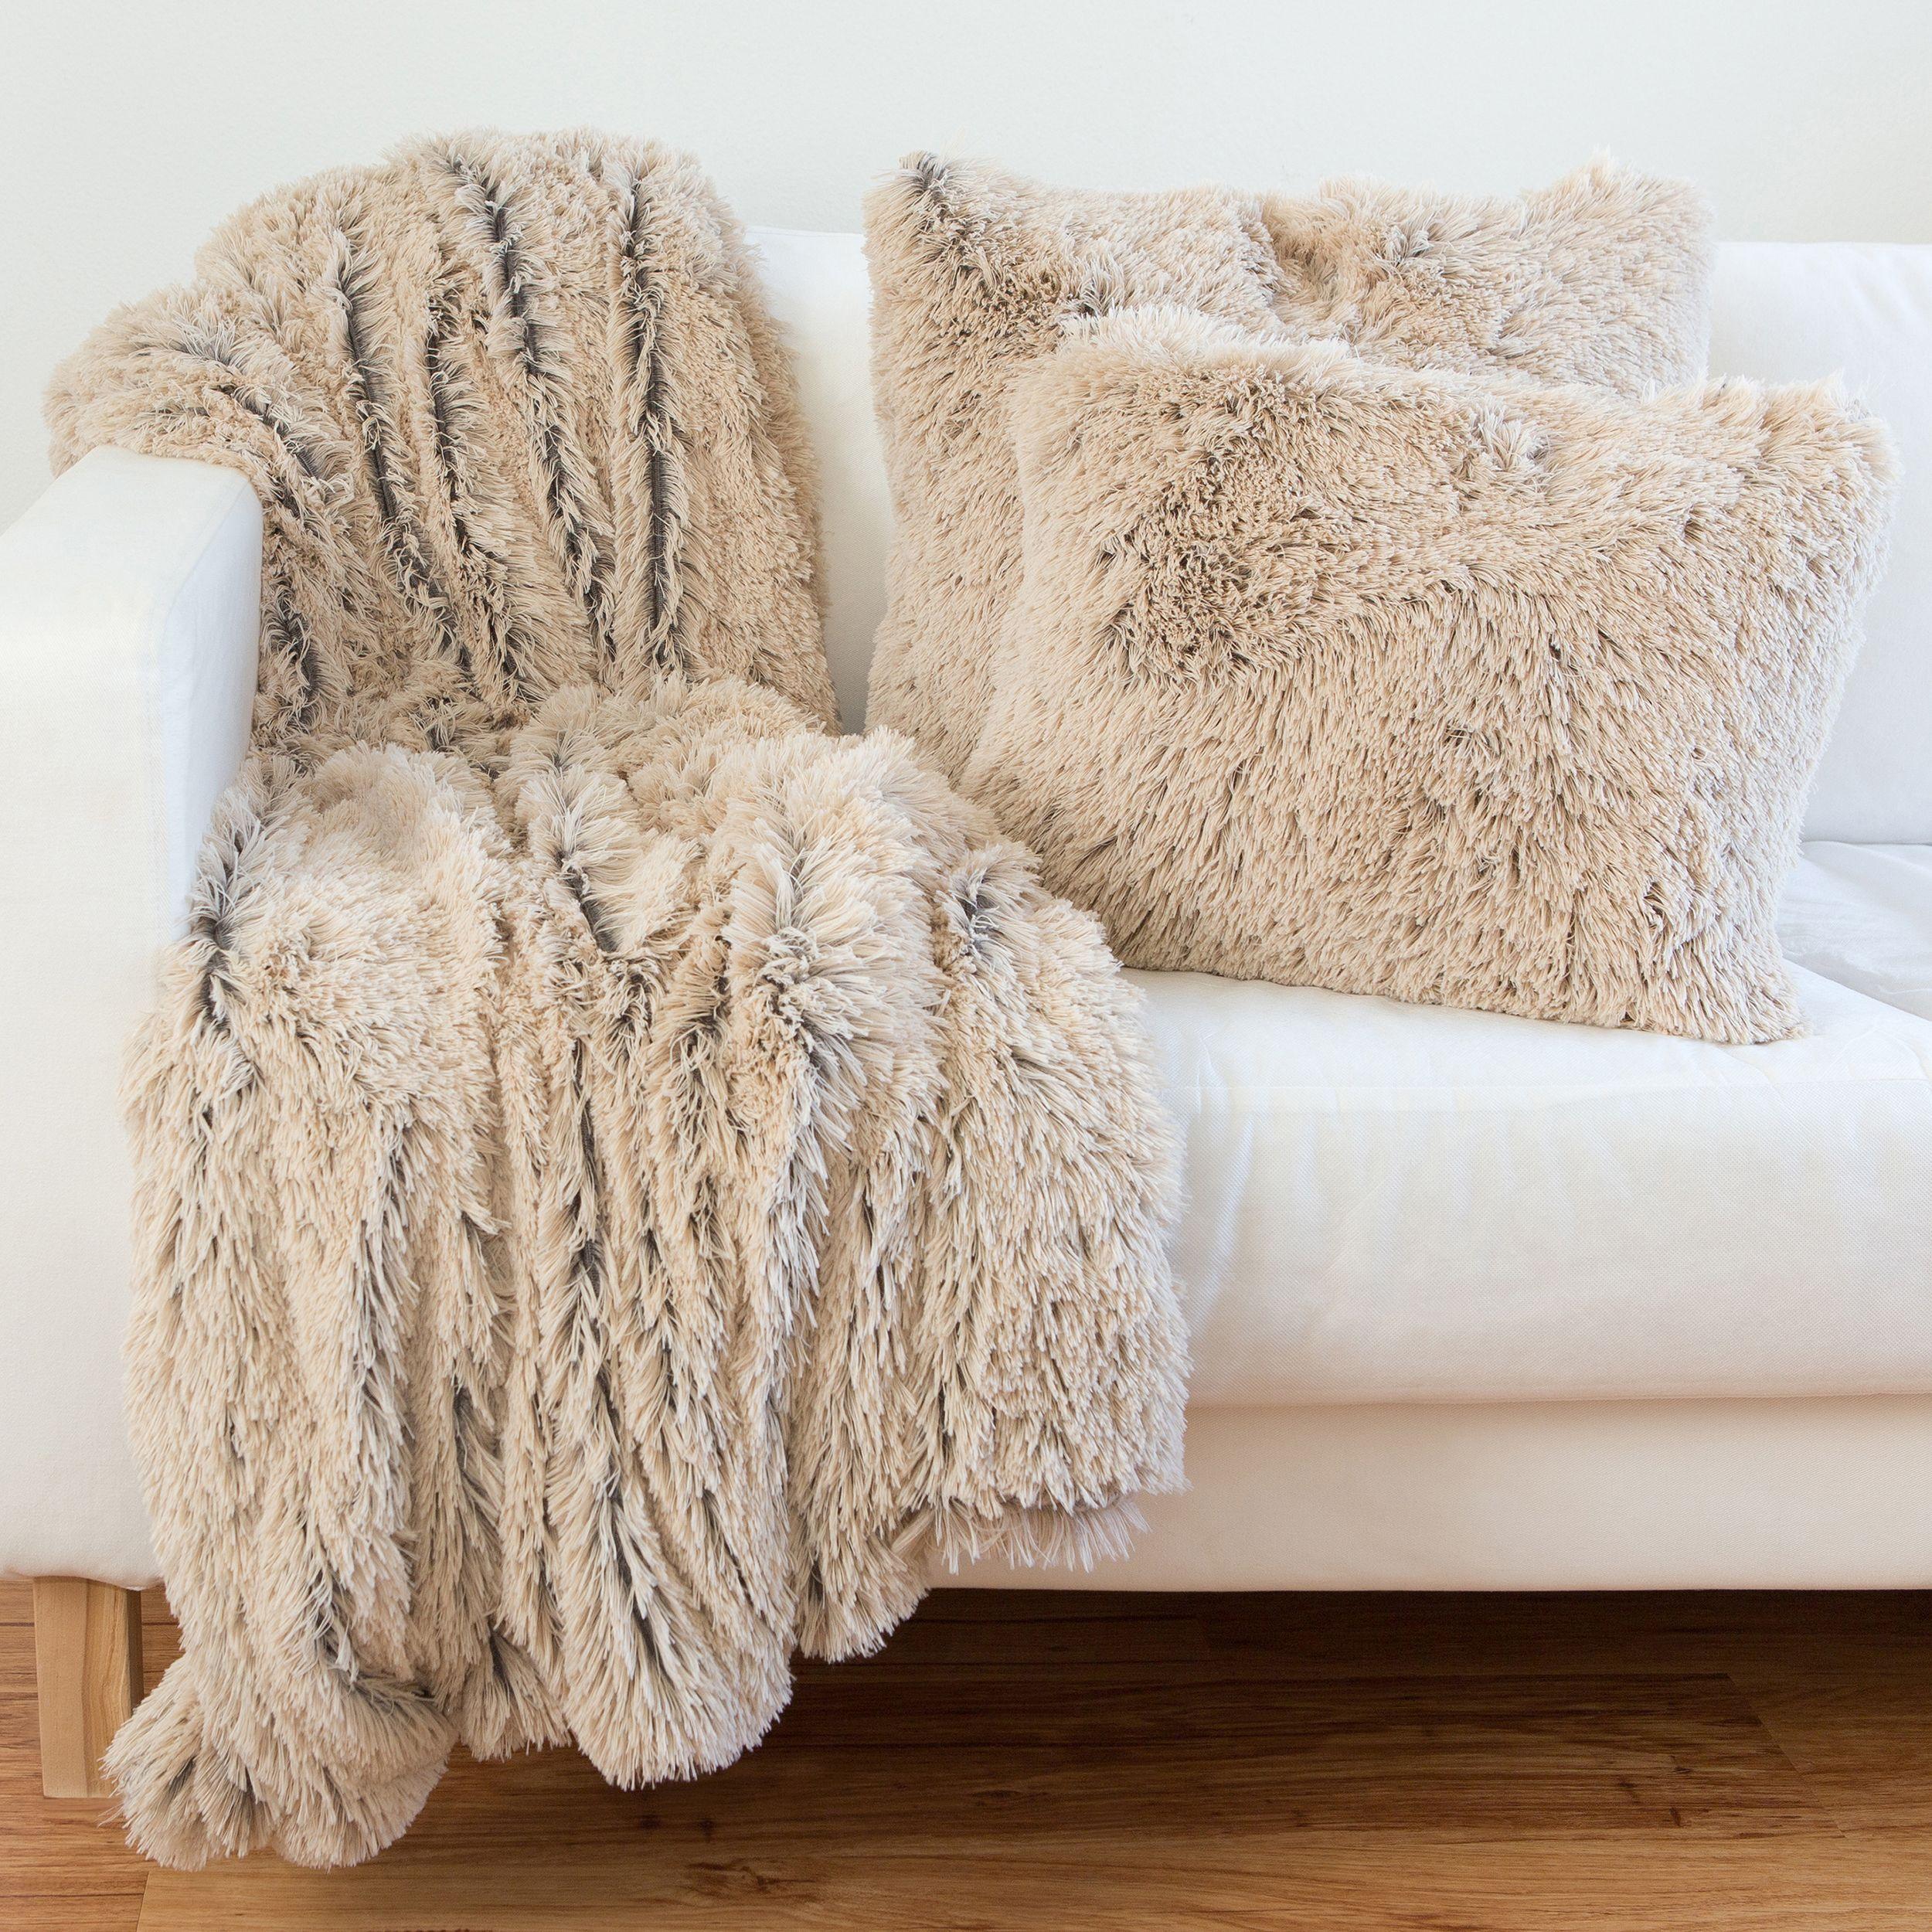 Maison Rouge Hugo Shag Faux Fur Pillows, Throw and Set | Designer ... for Sheep Fur Blanket  585ifm